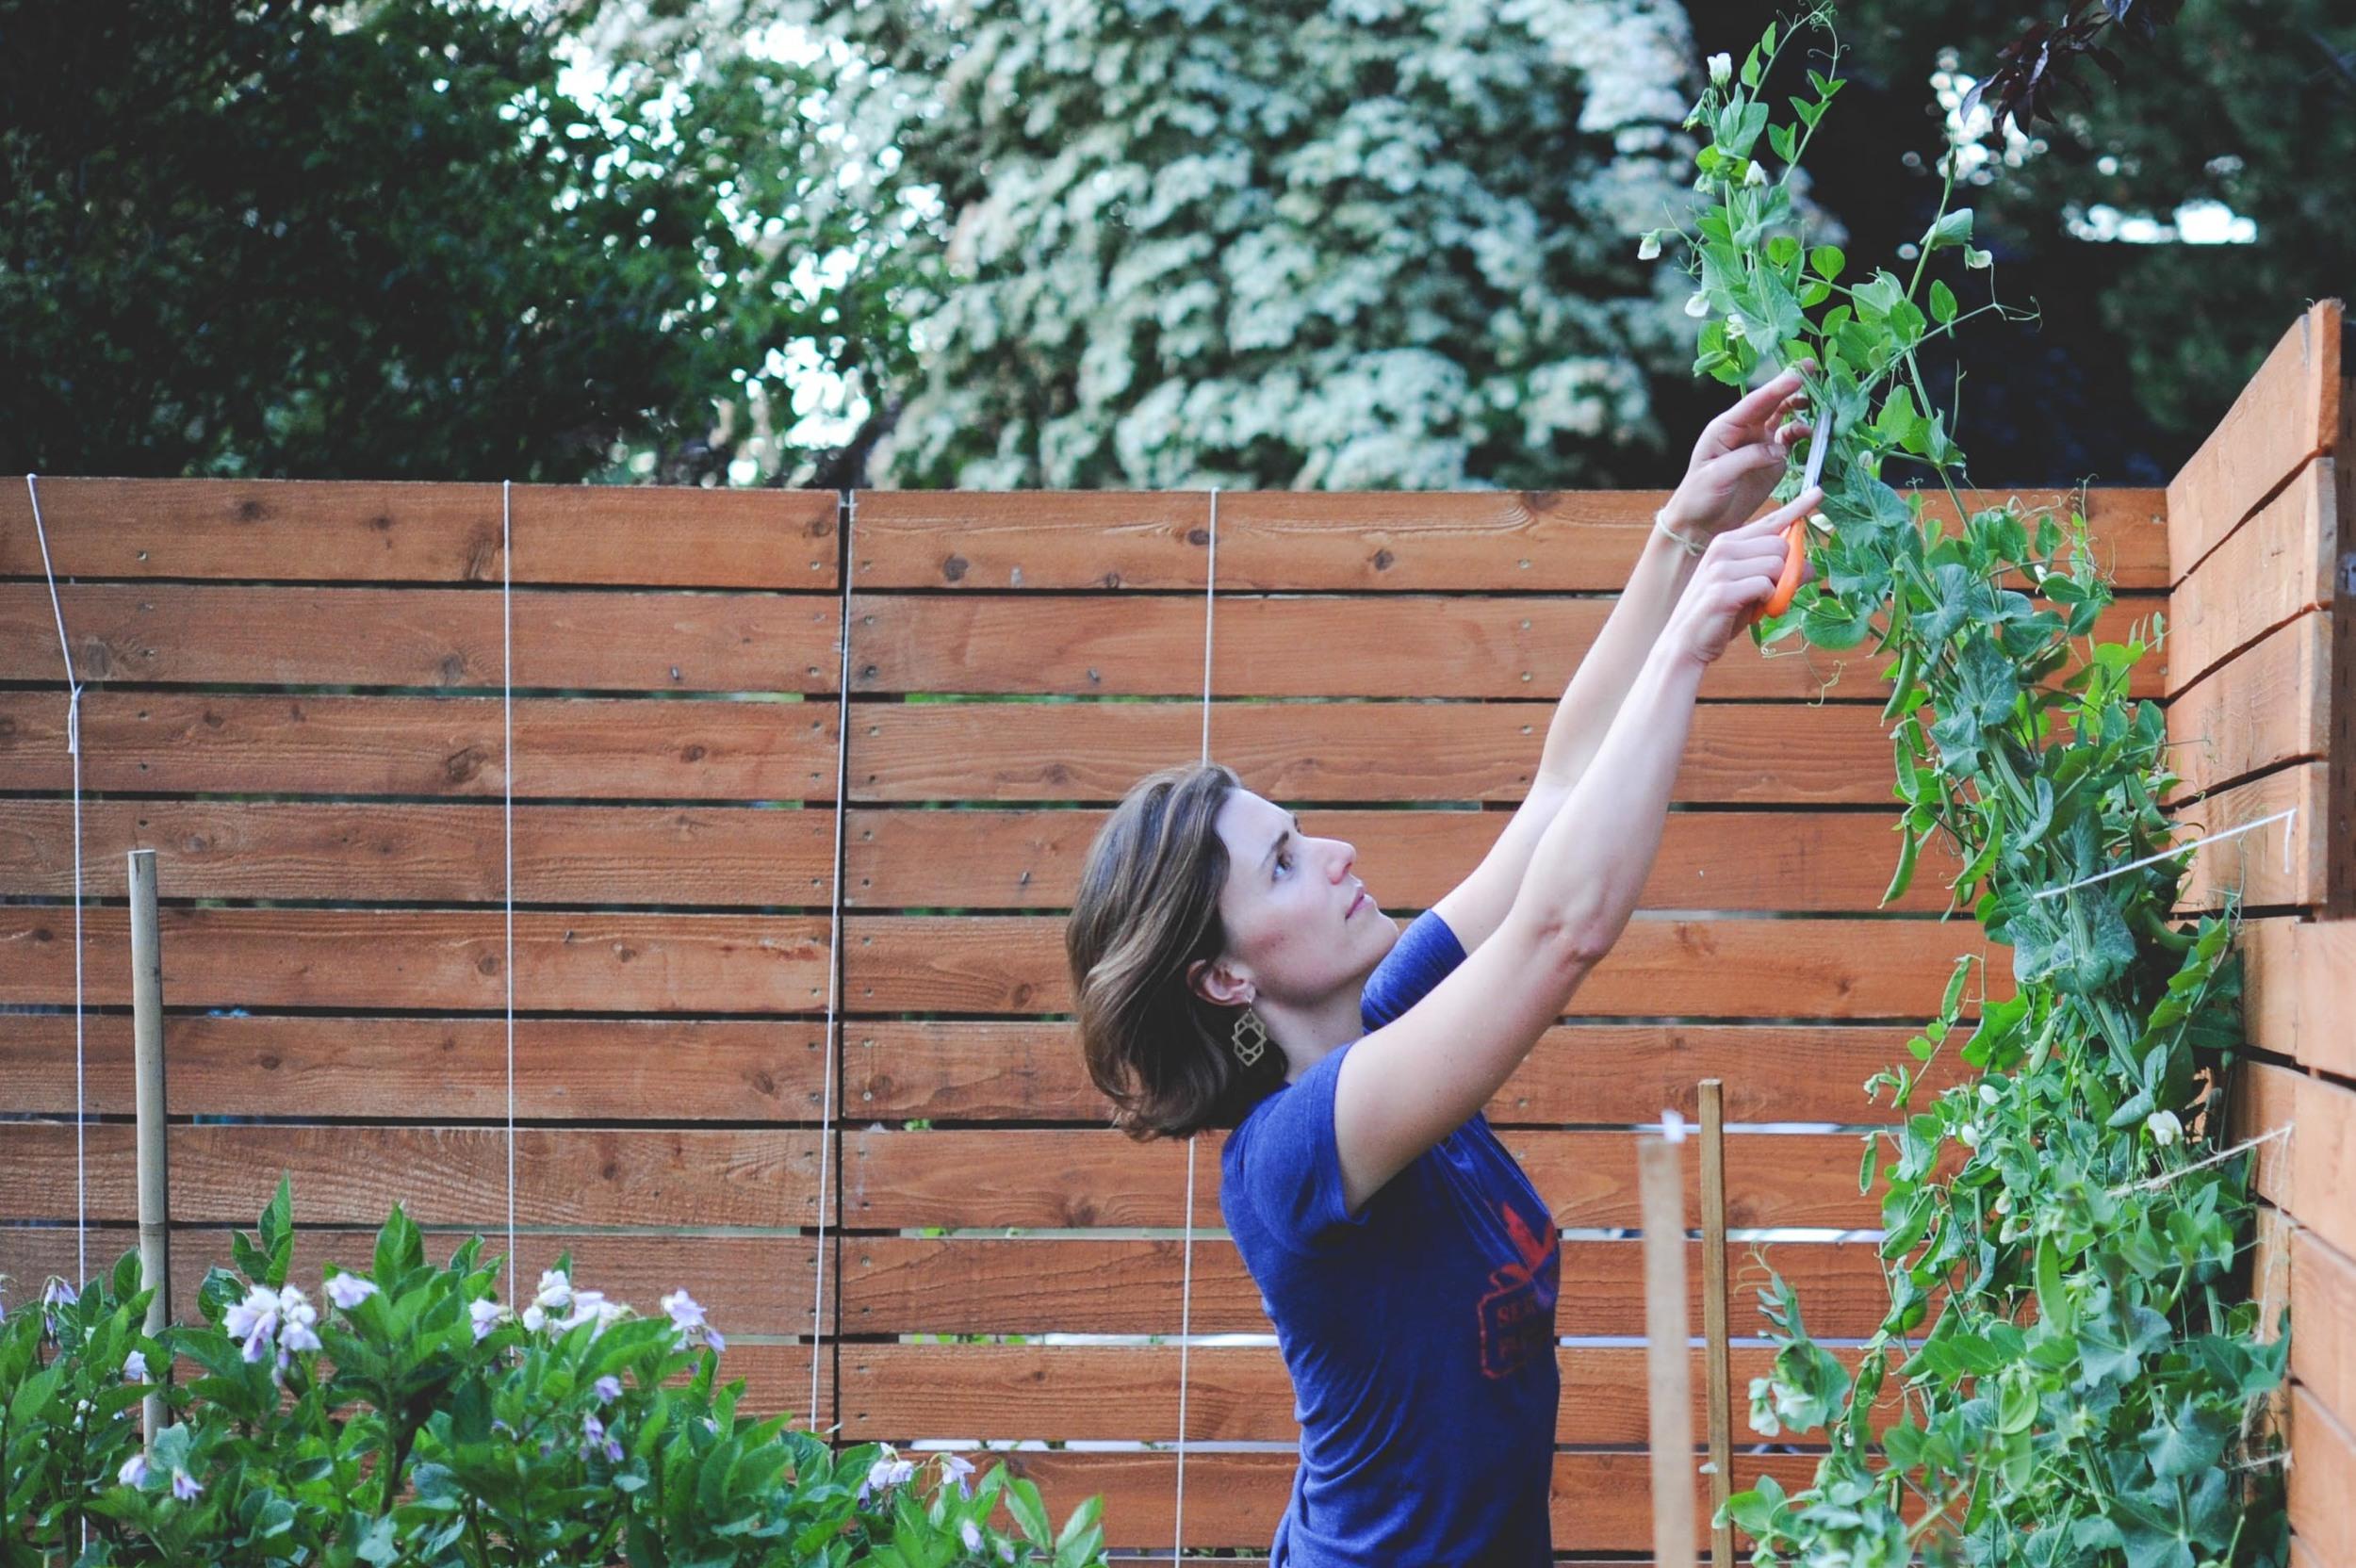 Hilary Dahl_Trimming Peas_Seattle Urban Farm Co.